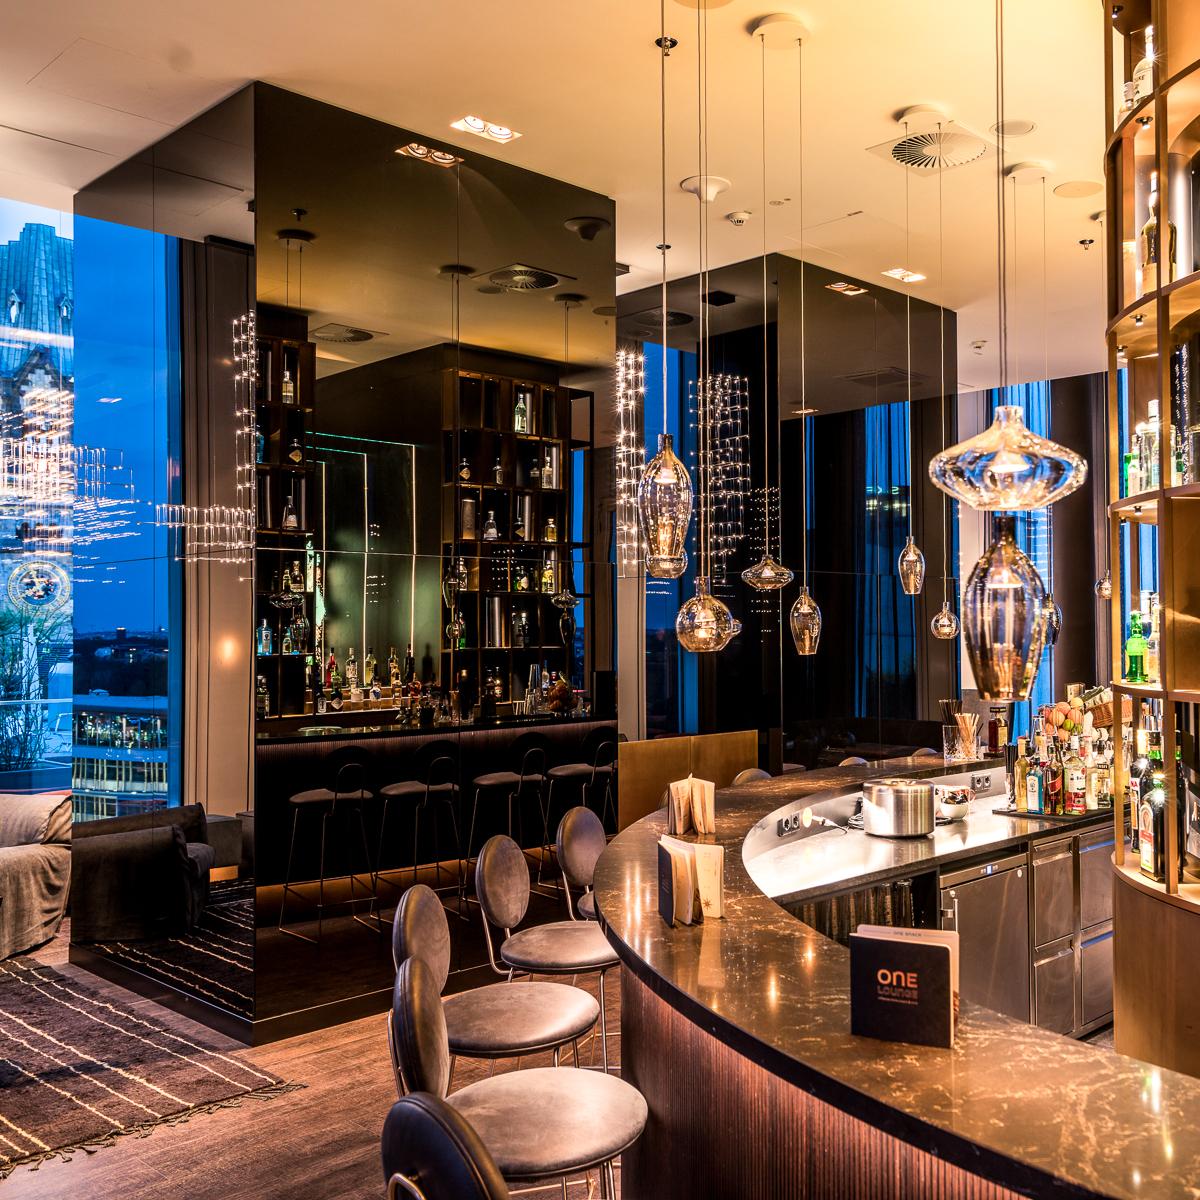 One Lounge Bar im Berlin Upper West 2